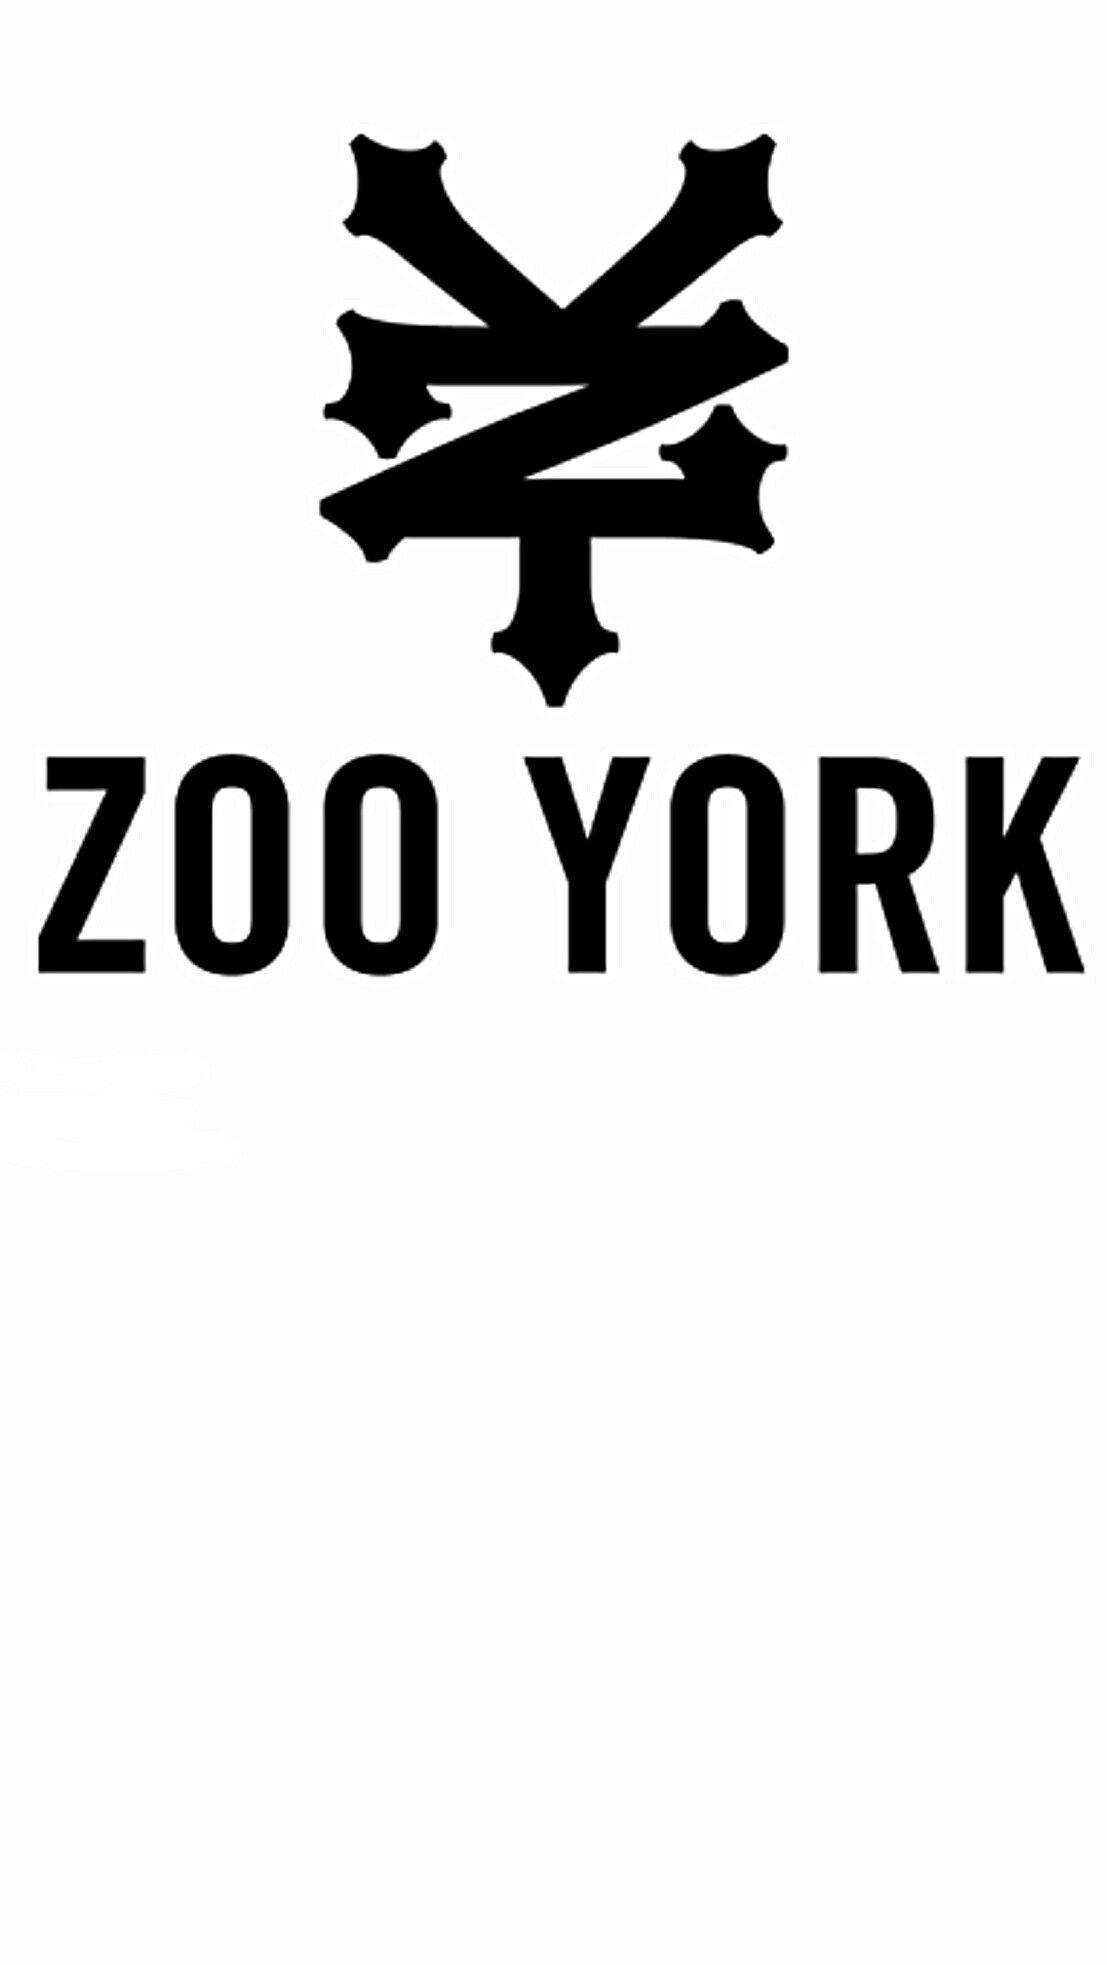 Zoo York Wallpapers Wallpaper Cave